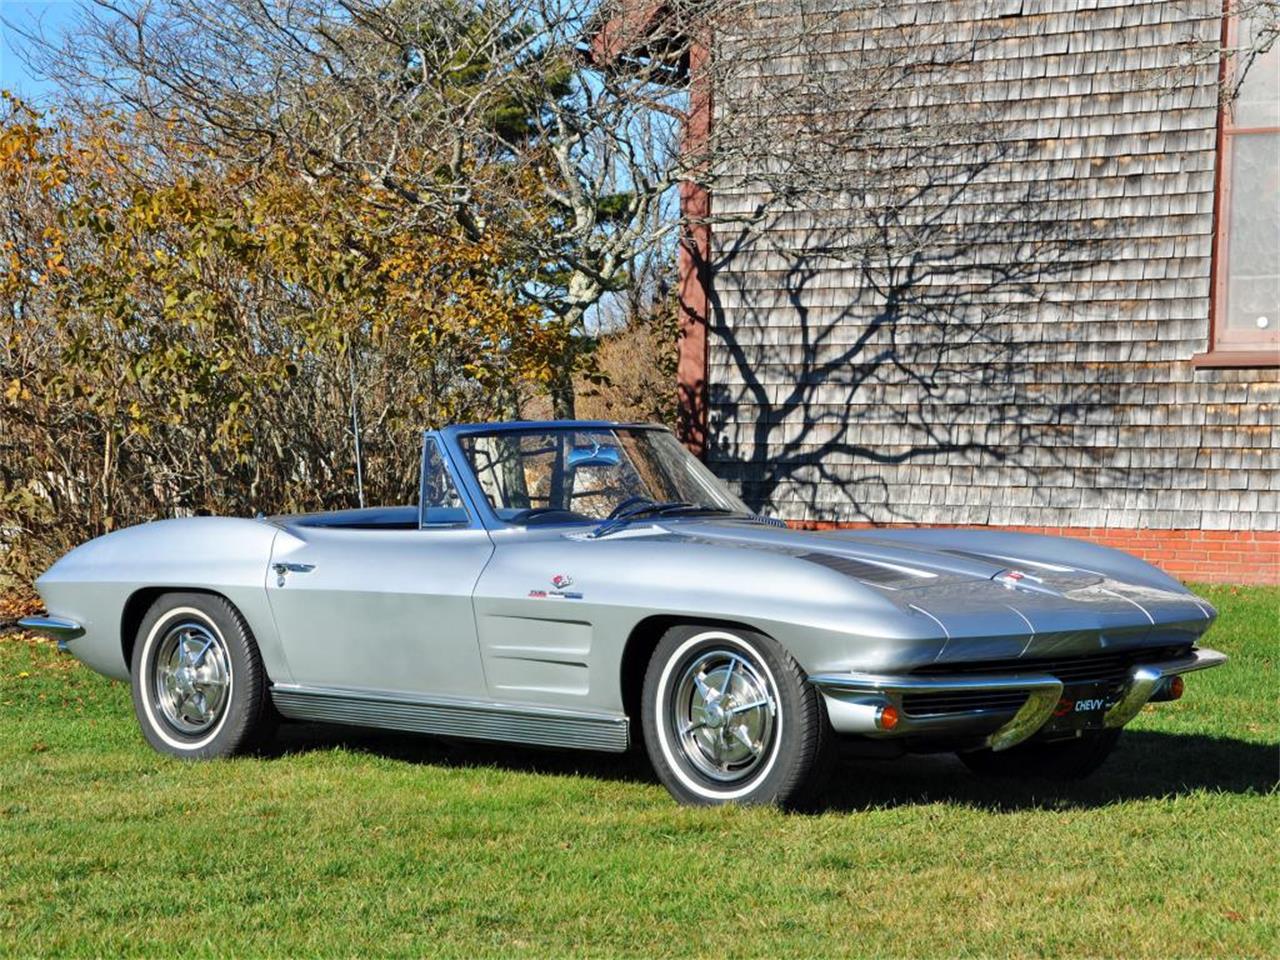 1963 Chevrolet Corvette For Sale Classiccars Com Cc 995260